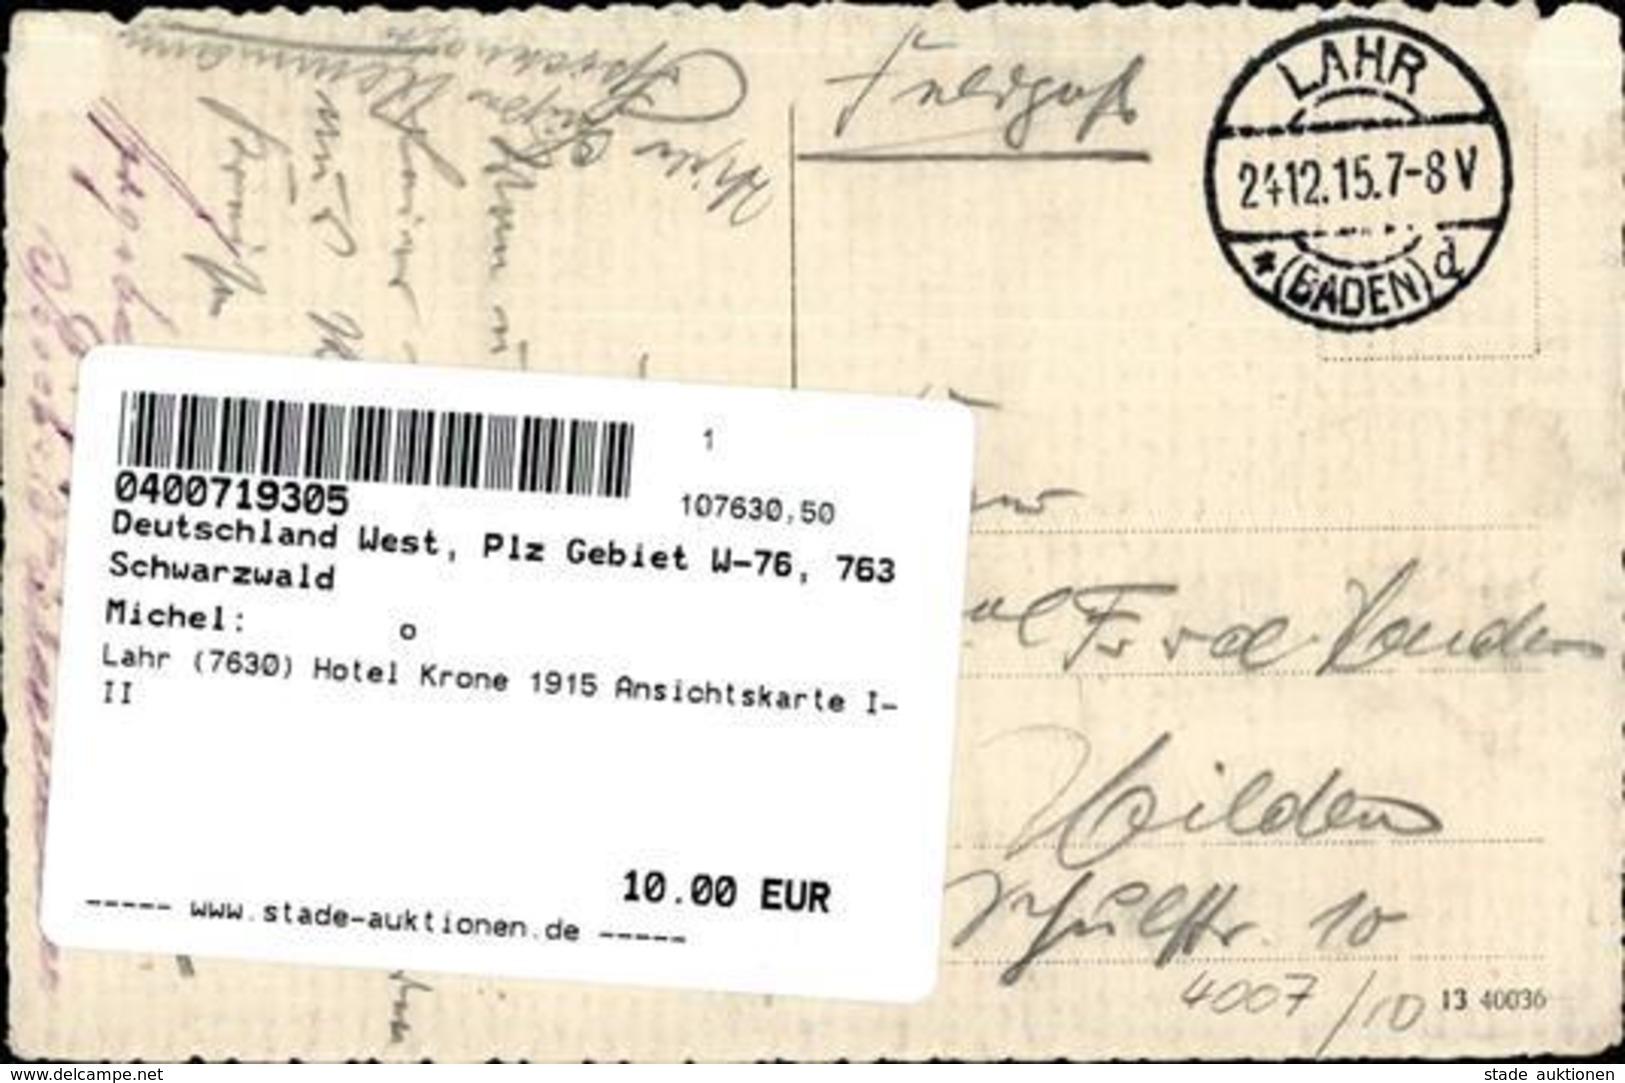 Lahr (7630) Hotel Krone 1915 Ansichtskarte I-II - Weltkrieg 1914-18